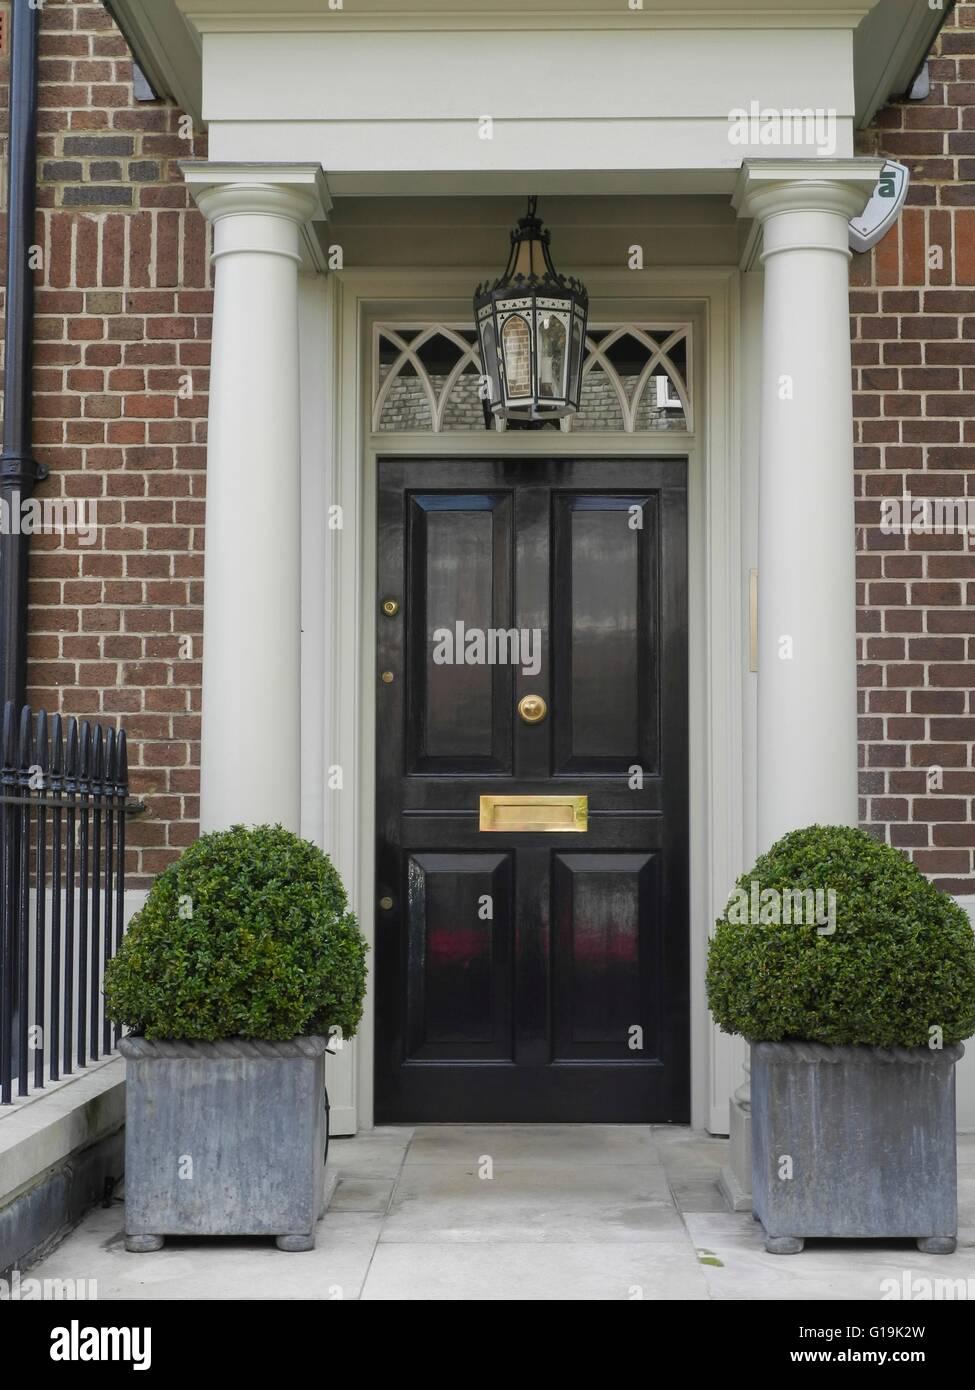 elegant front doors. Plain Elegant Elegant Painted Front Doors In Mayfair Notting Hill Chelsae London UK To Front Doors Alamy